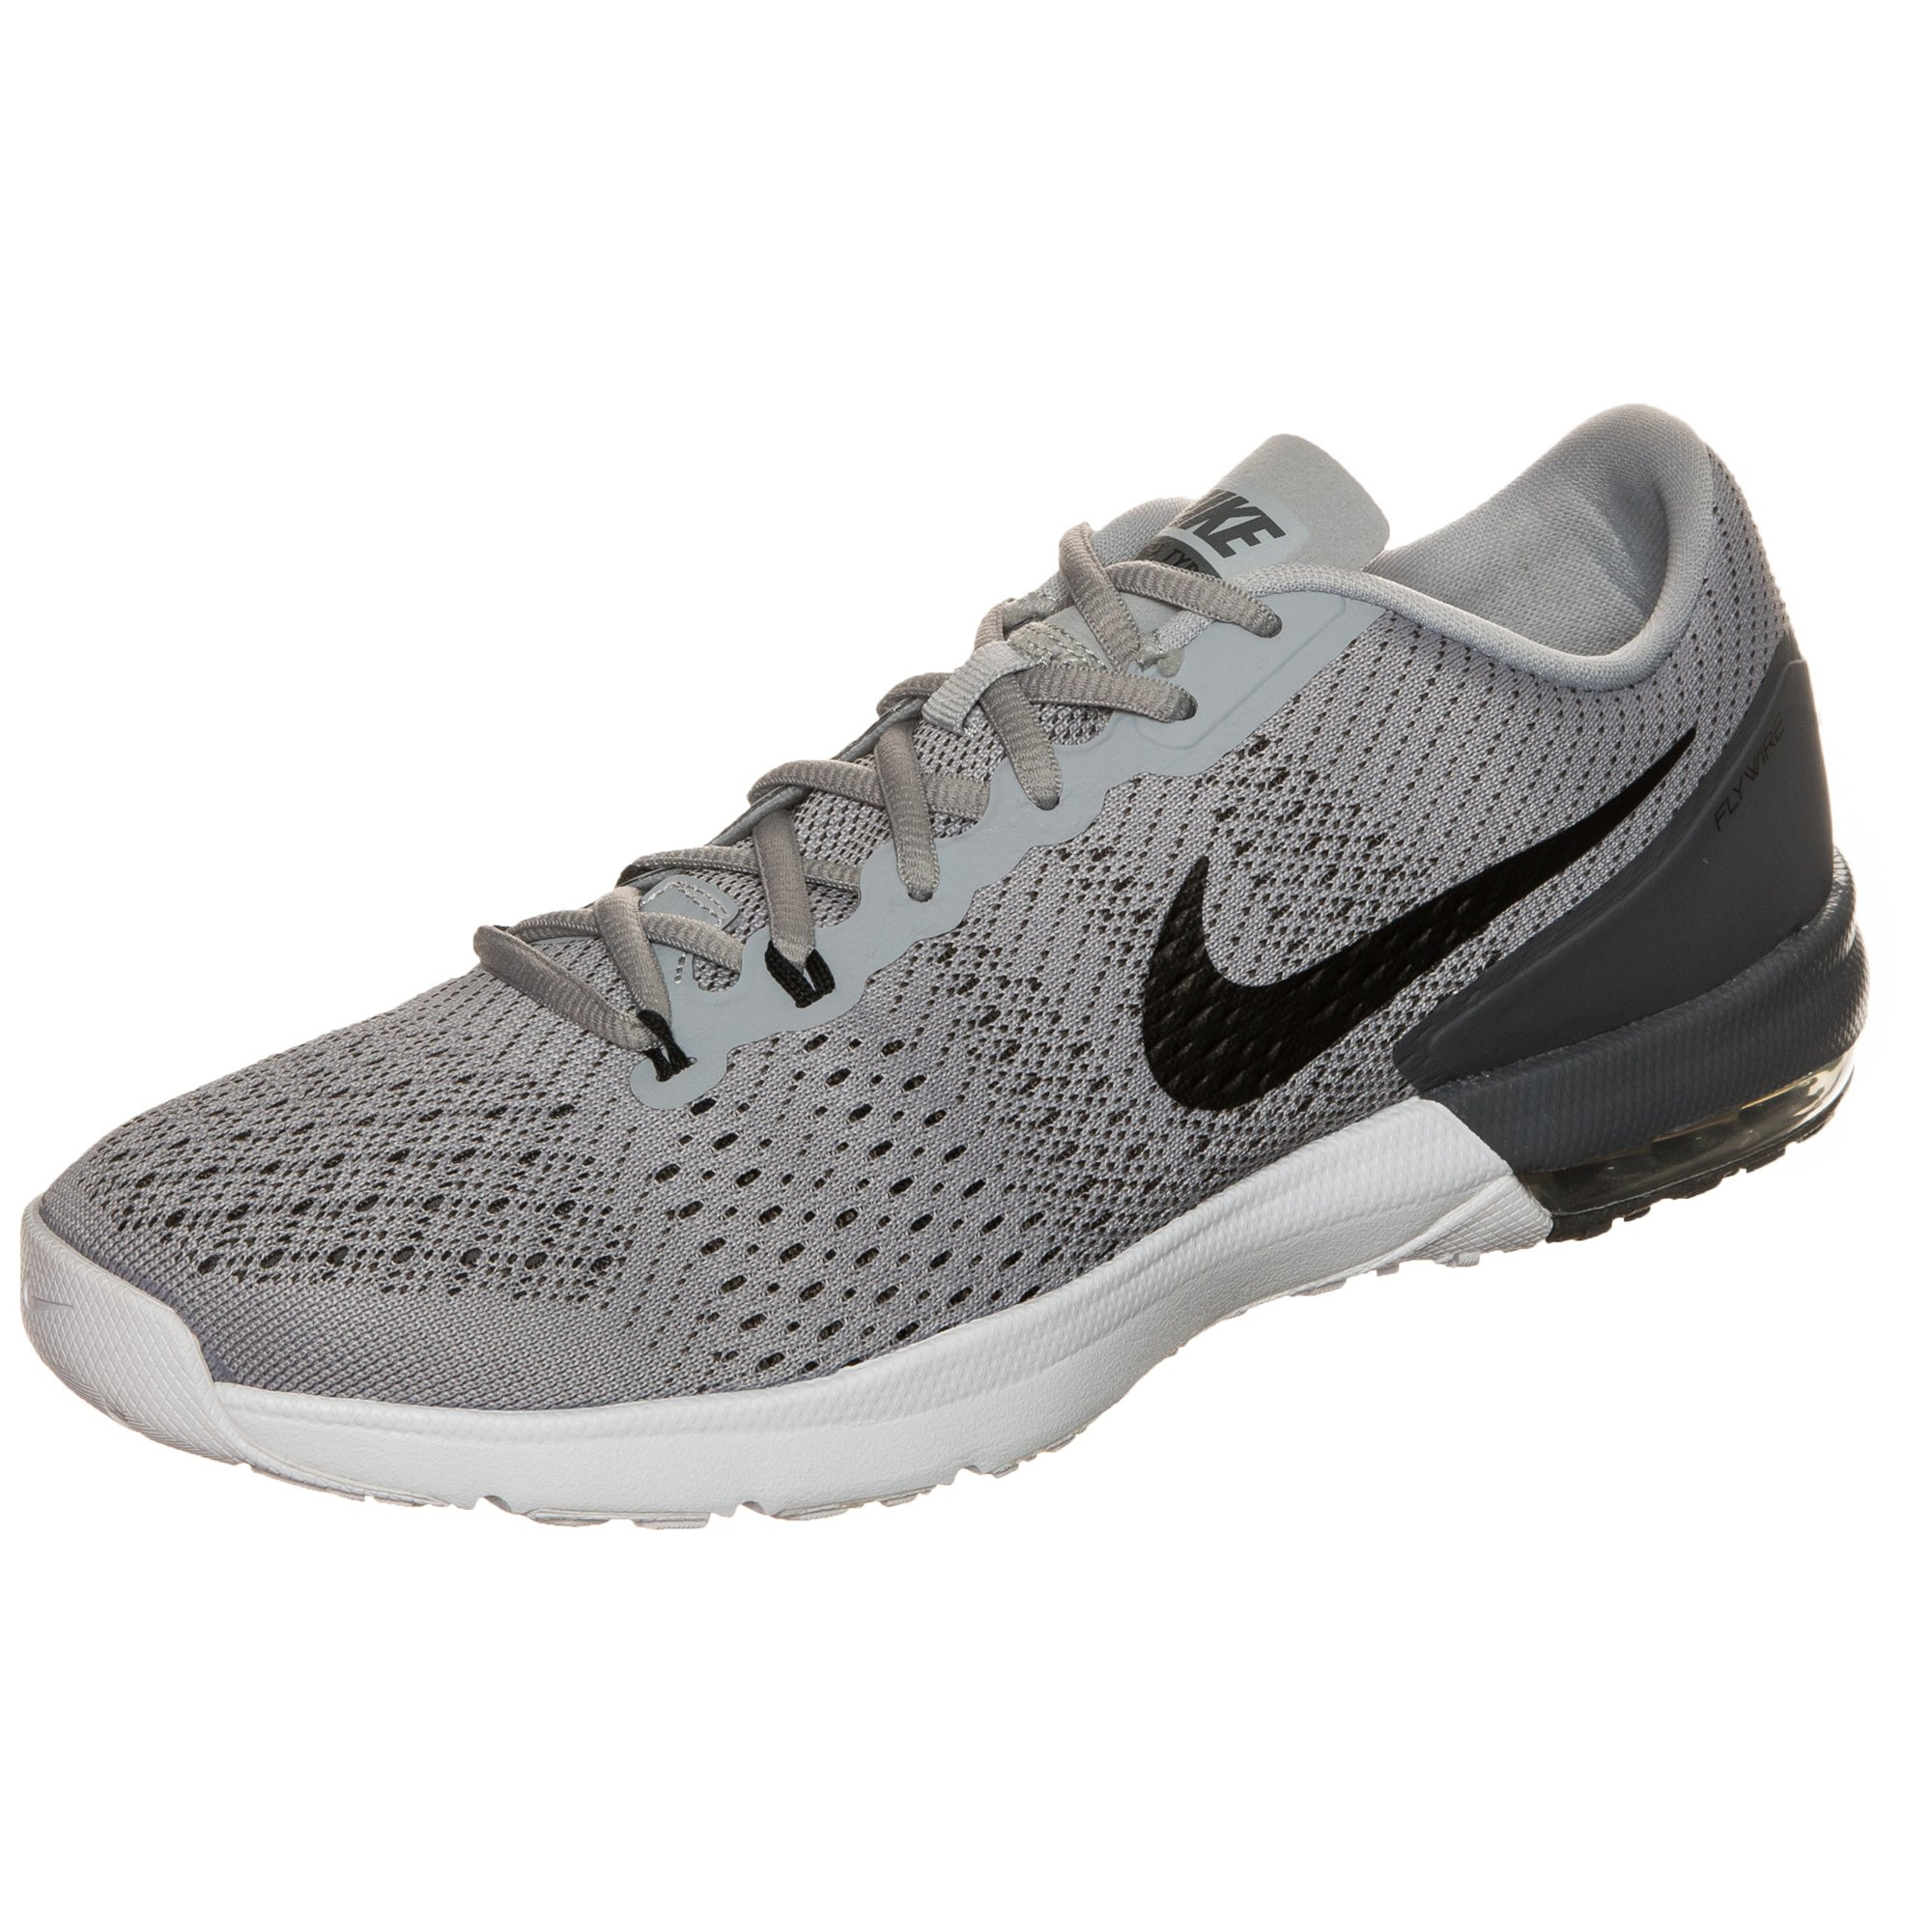 Nike Men's Air Max Typha Training Shoe (7, Wolf Grey/Black-Dark Grey)